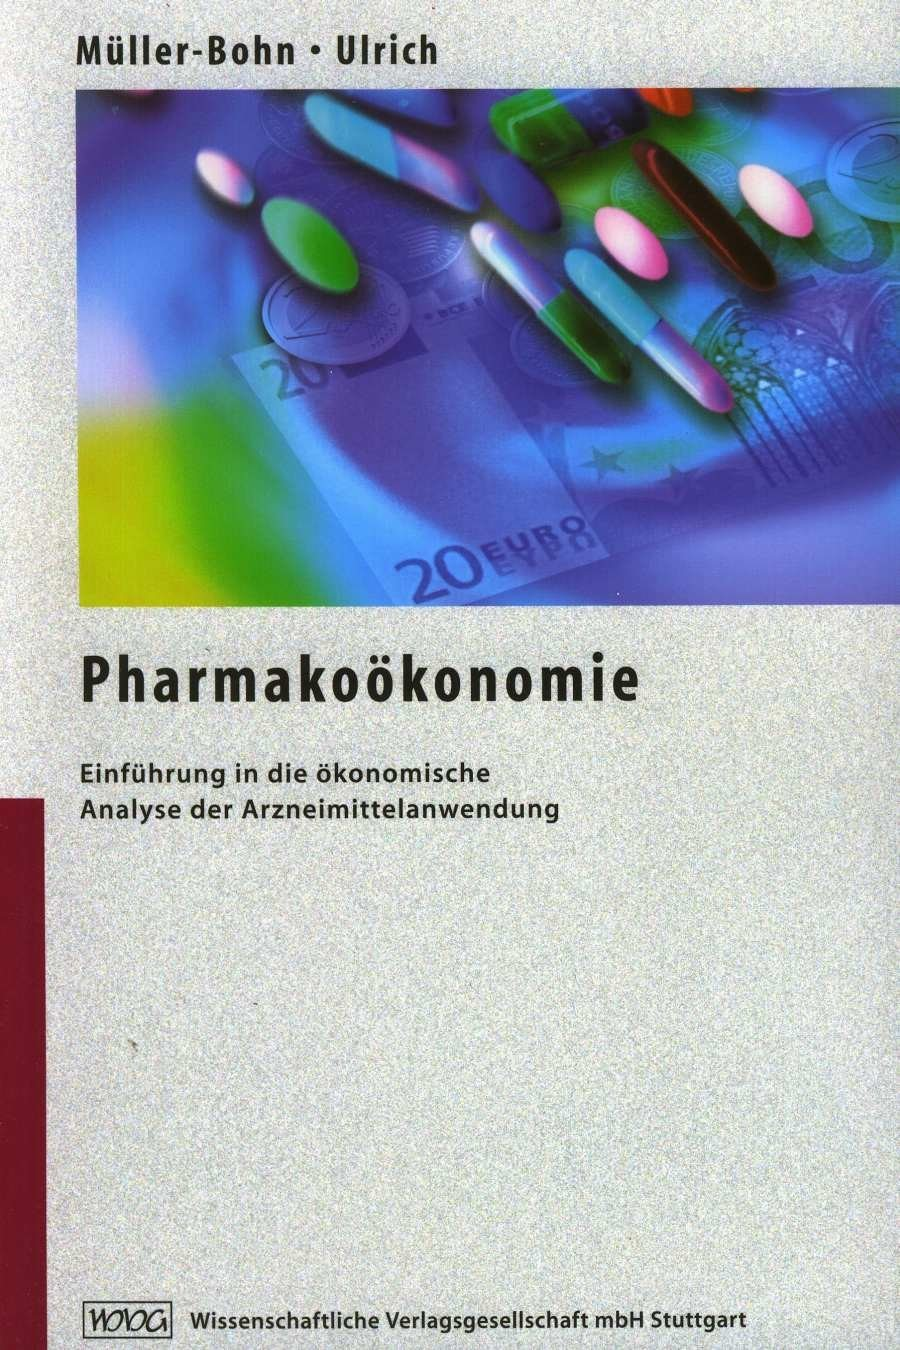 Pharmakoökonomie | Müller-Bohn / Ulrich, 2000 | Buch (Cover)